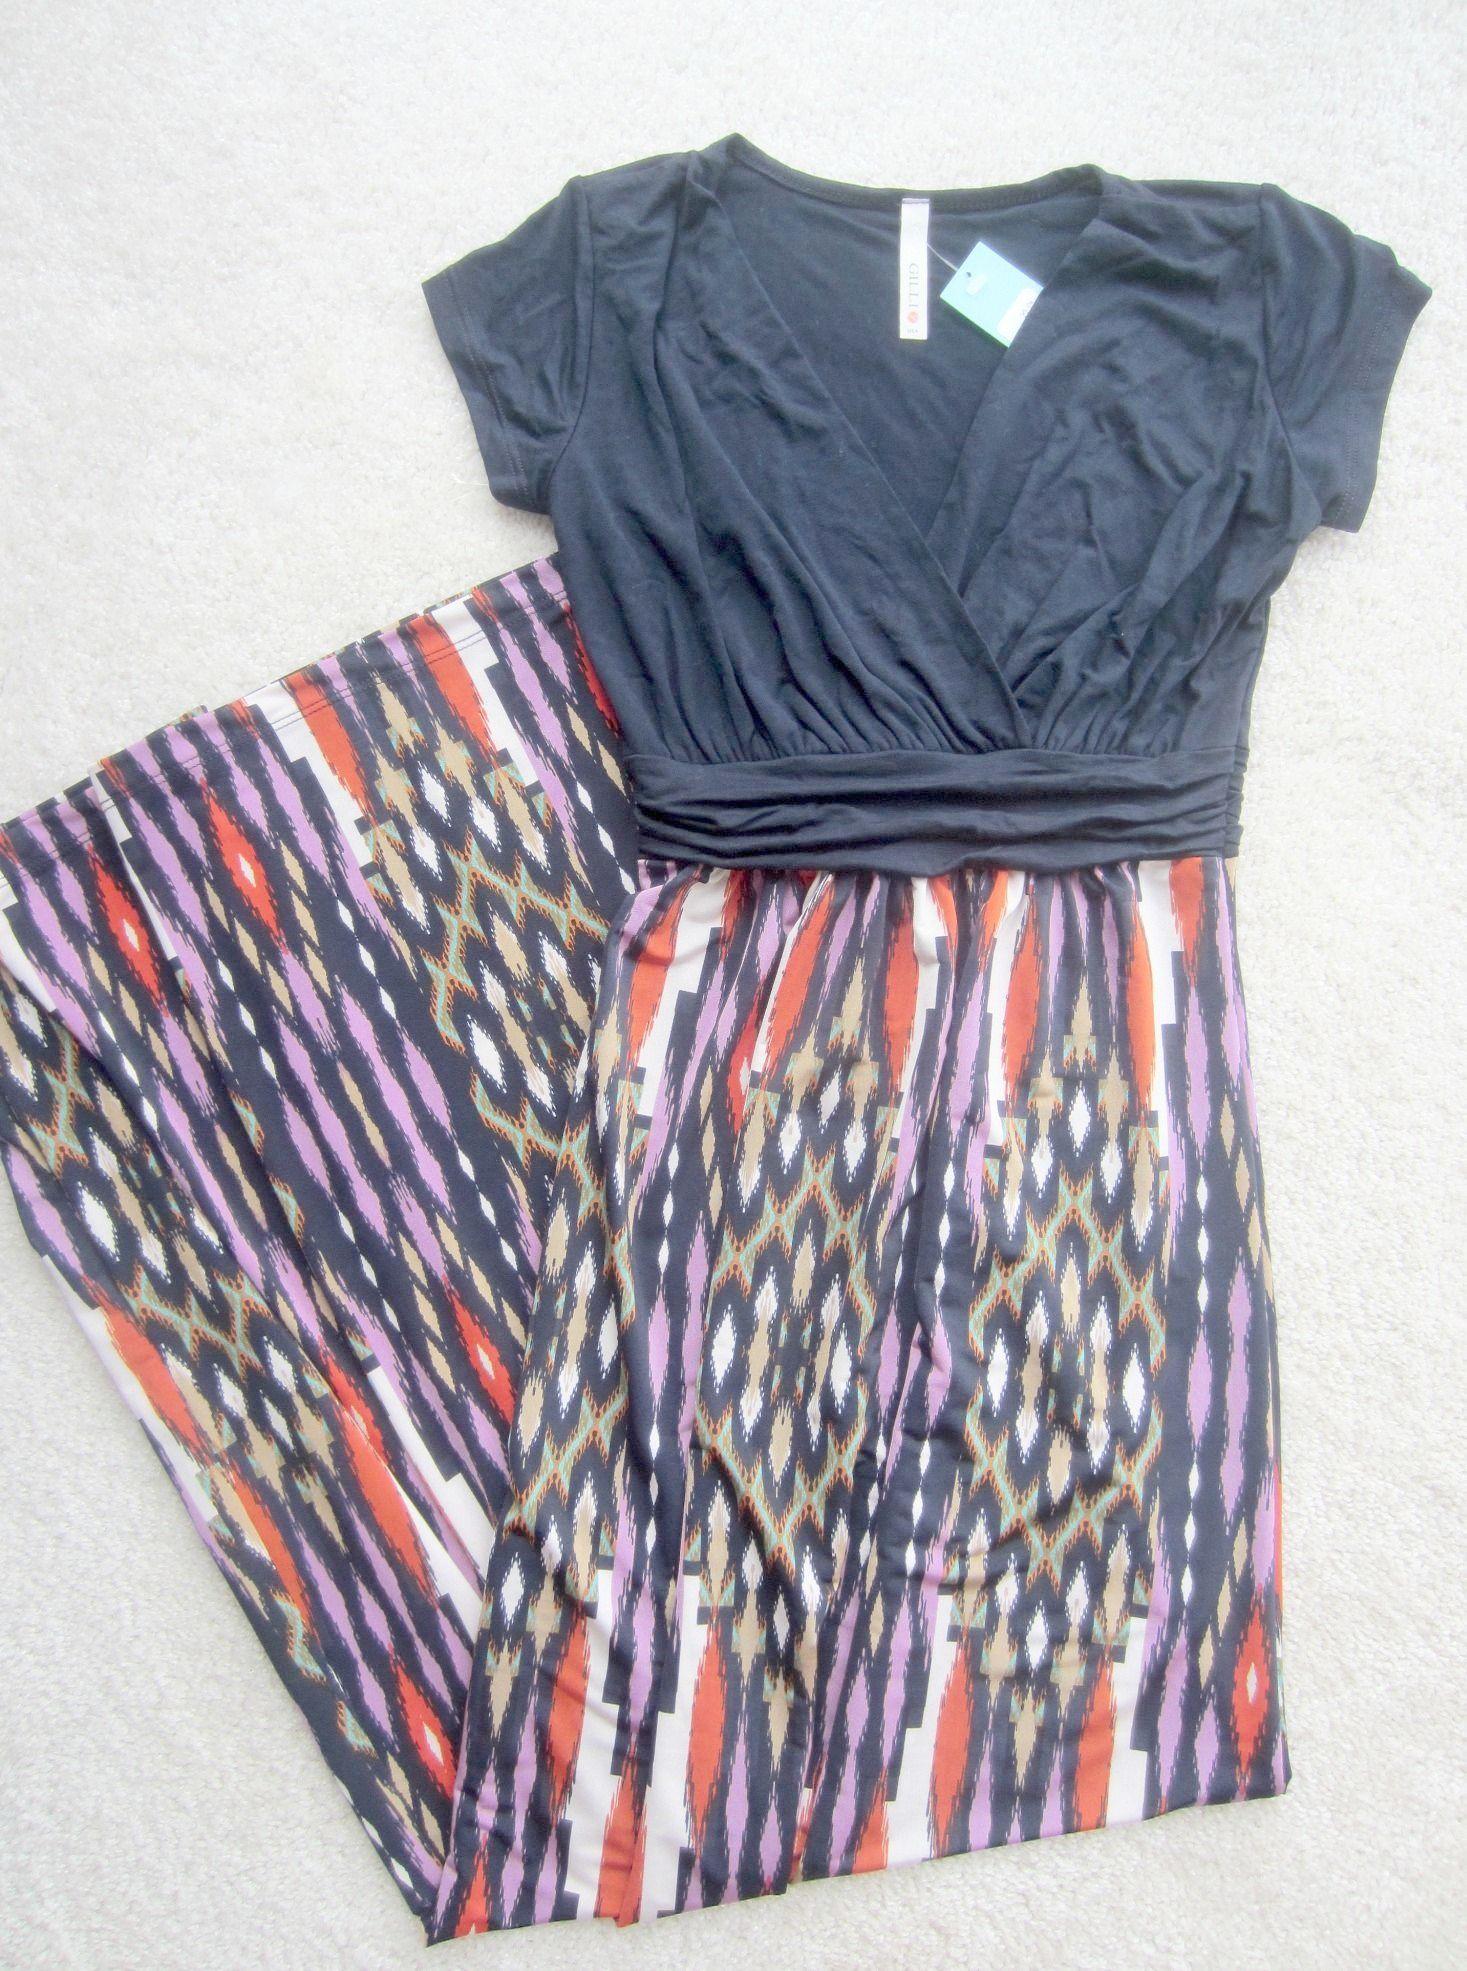 Short sleeve maxi dress cute maxi dress outfit ideas maxi dresses